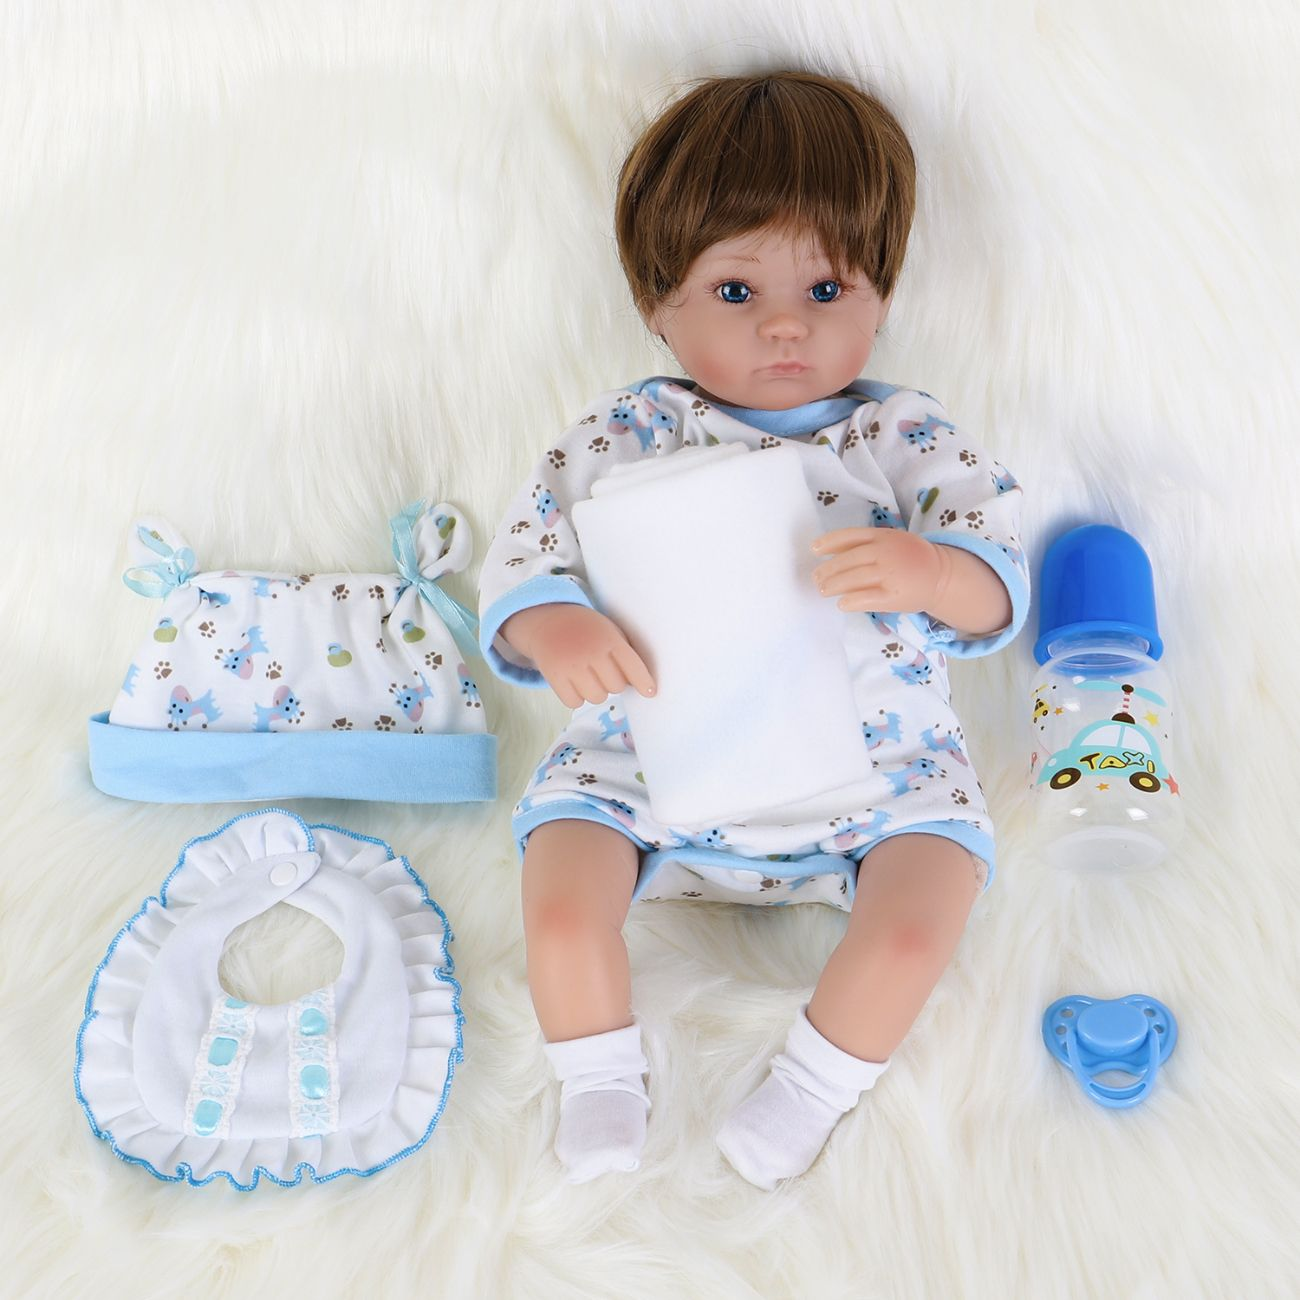 ENA Reborn Baby Boy Doll Realistic Silicone Vinyl Baby 10 inch Soft Body Lifelike Doll Gift Set for Ages 3+ 10 inch, Open Eyes Blue boy